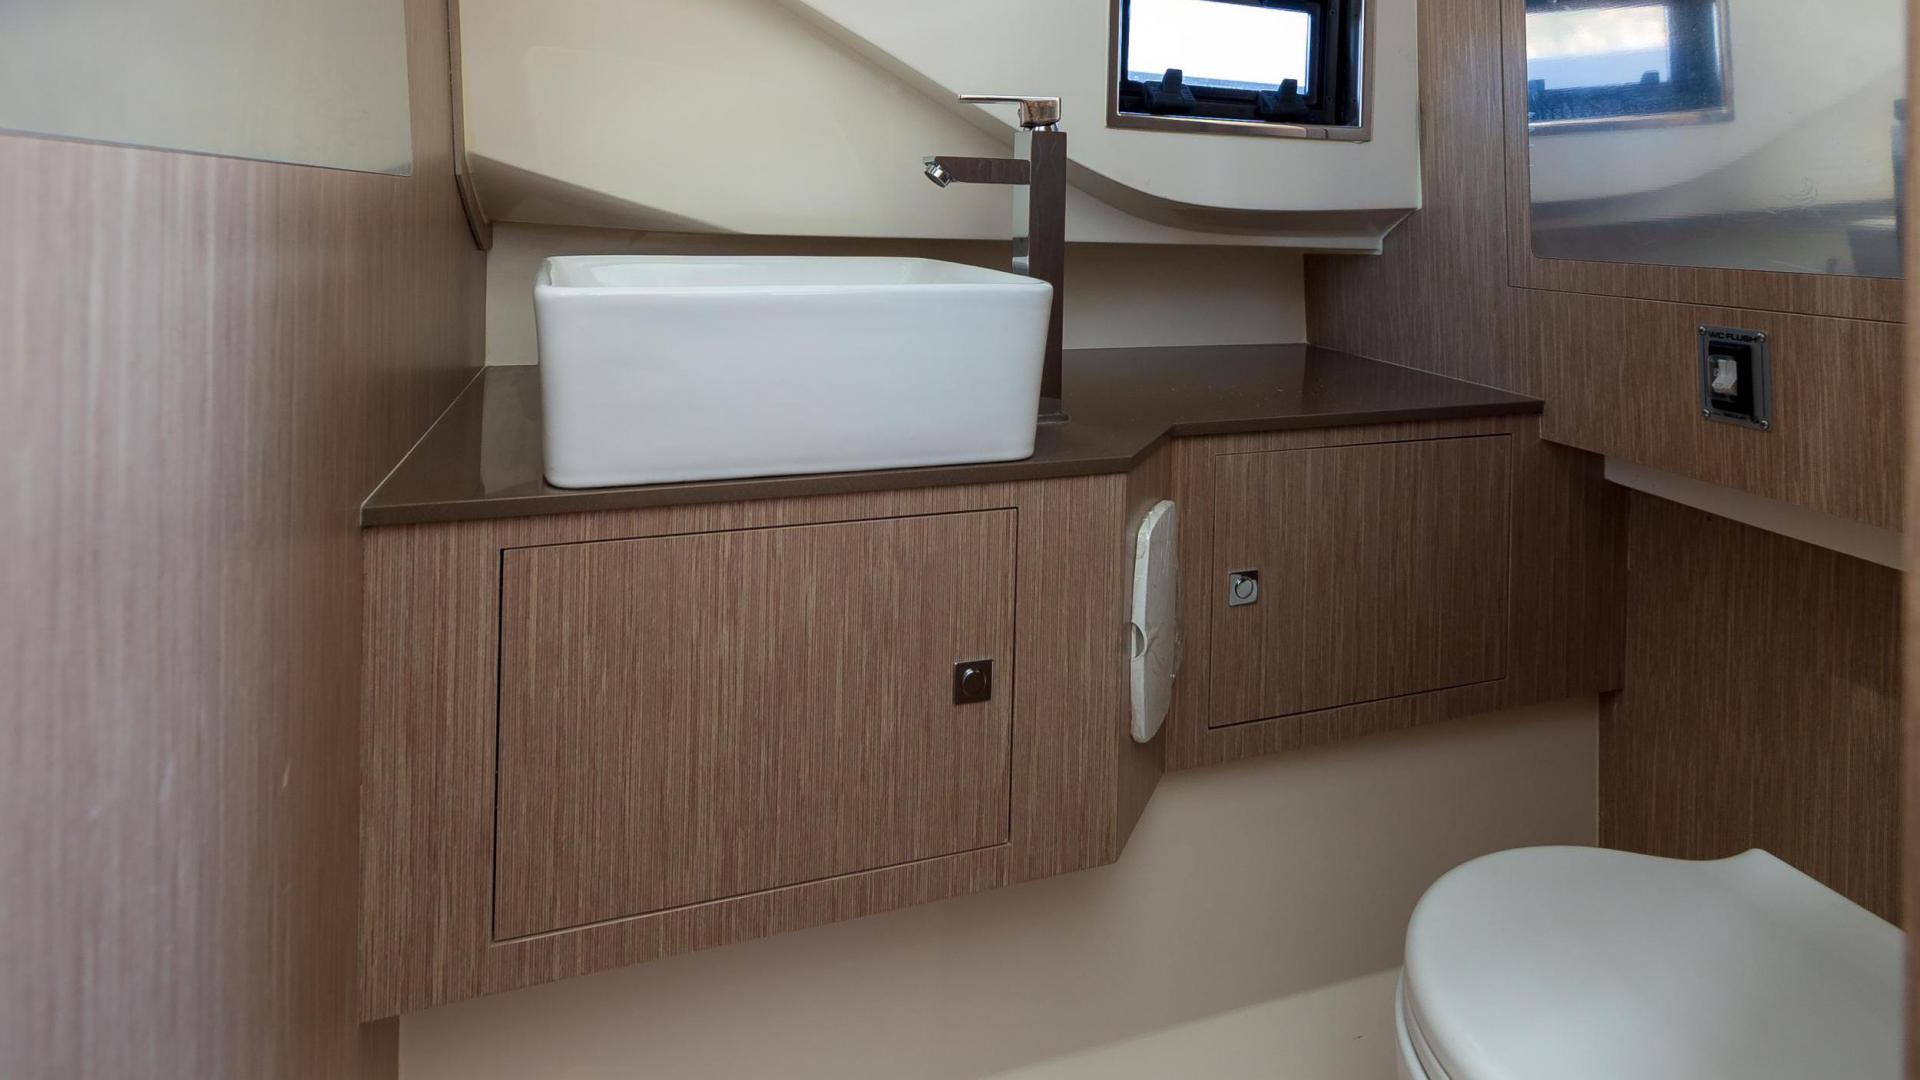 Prince 38 sport cabin - image 6